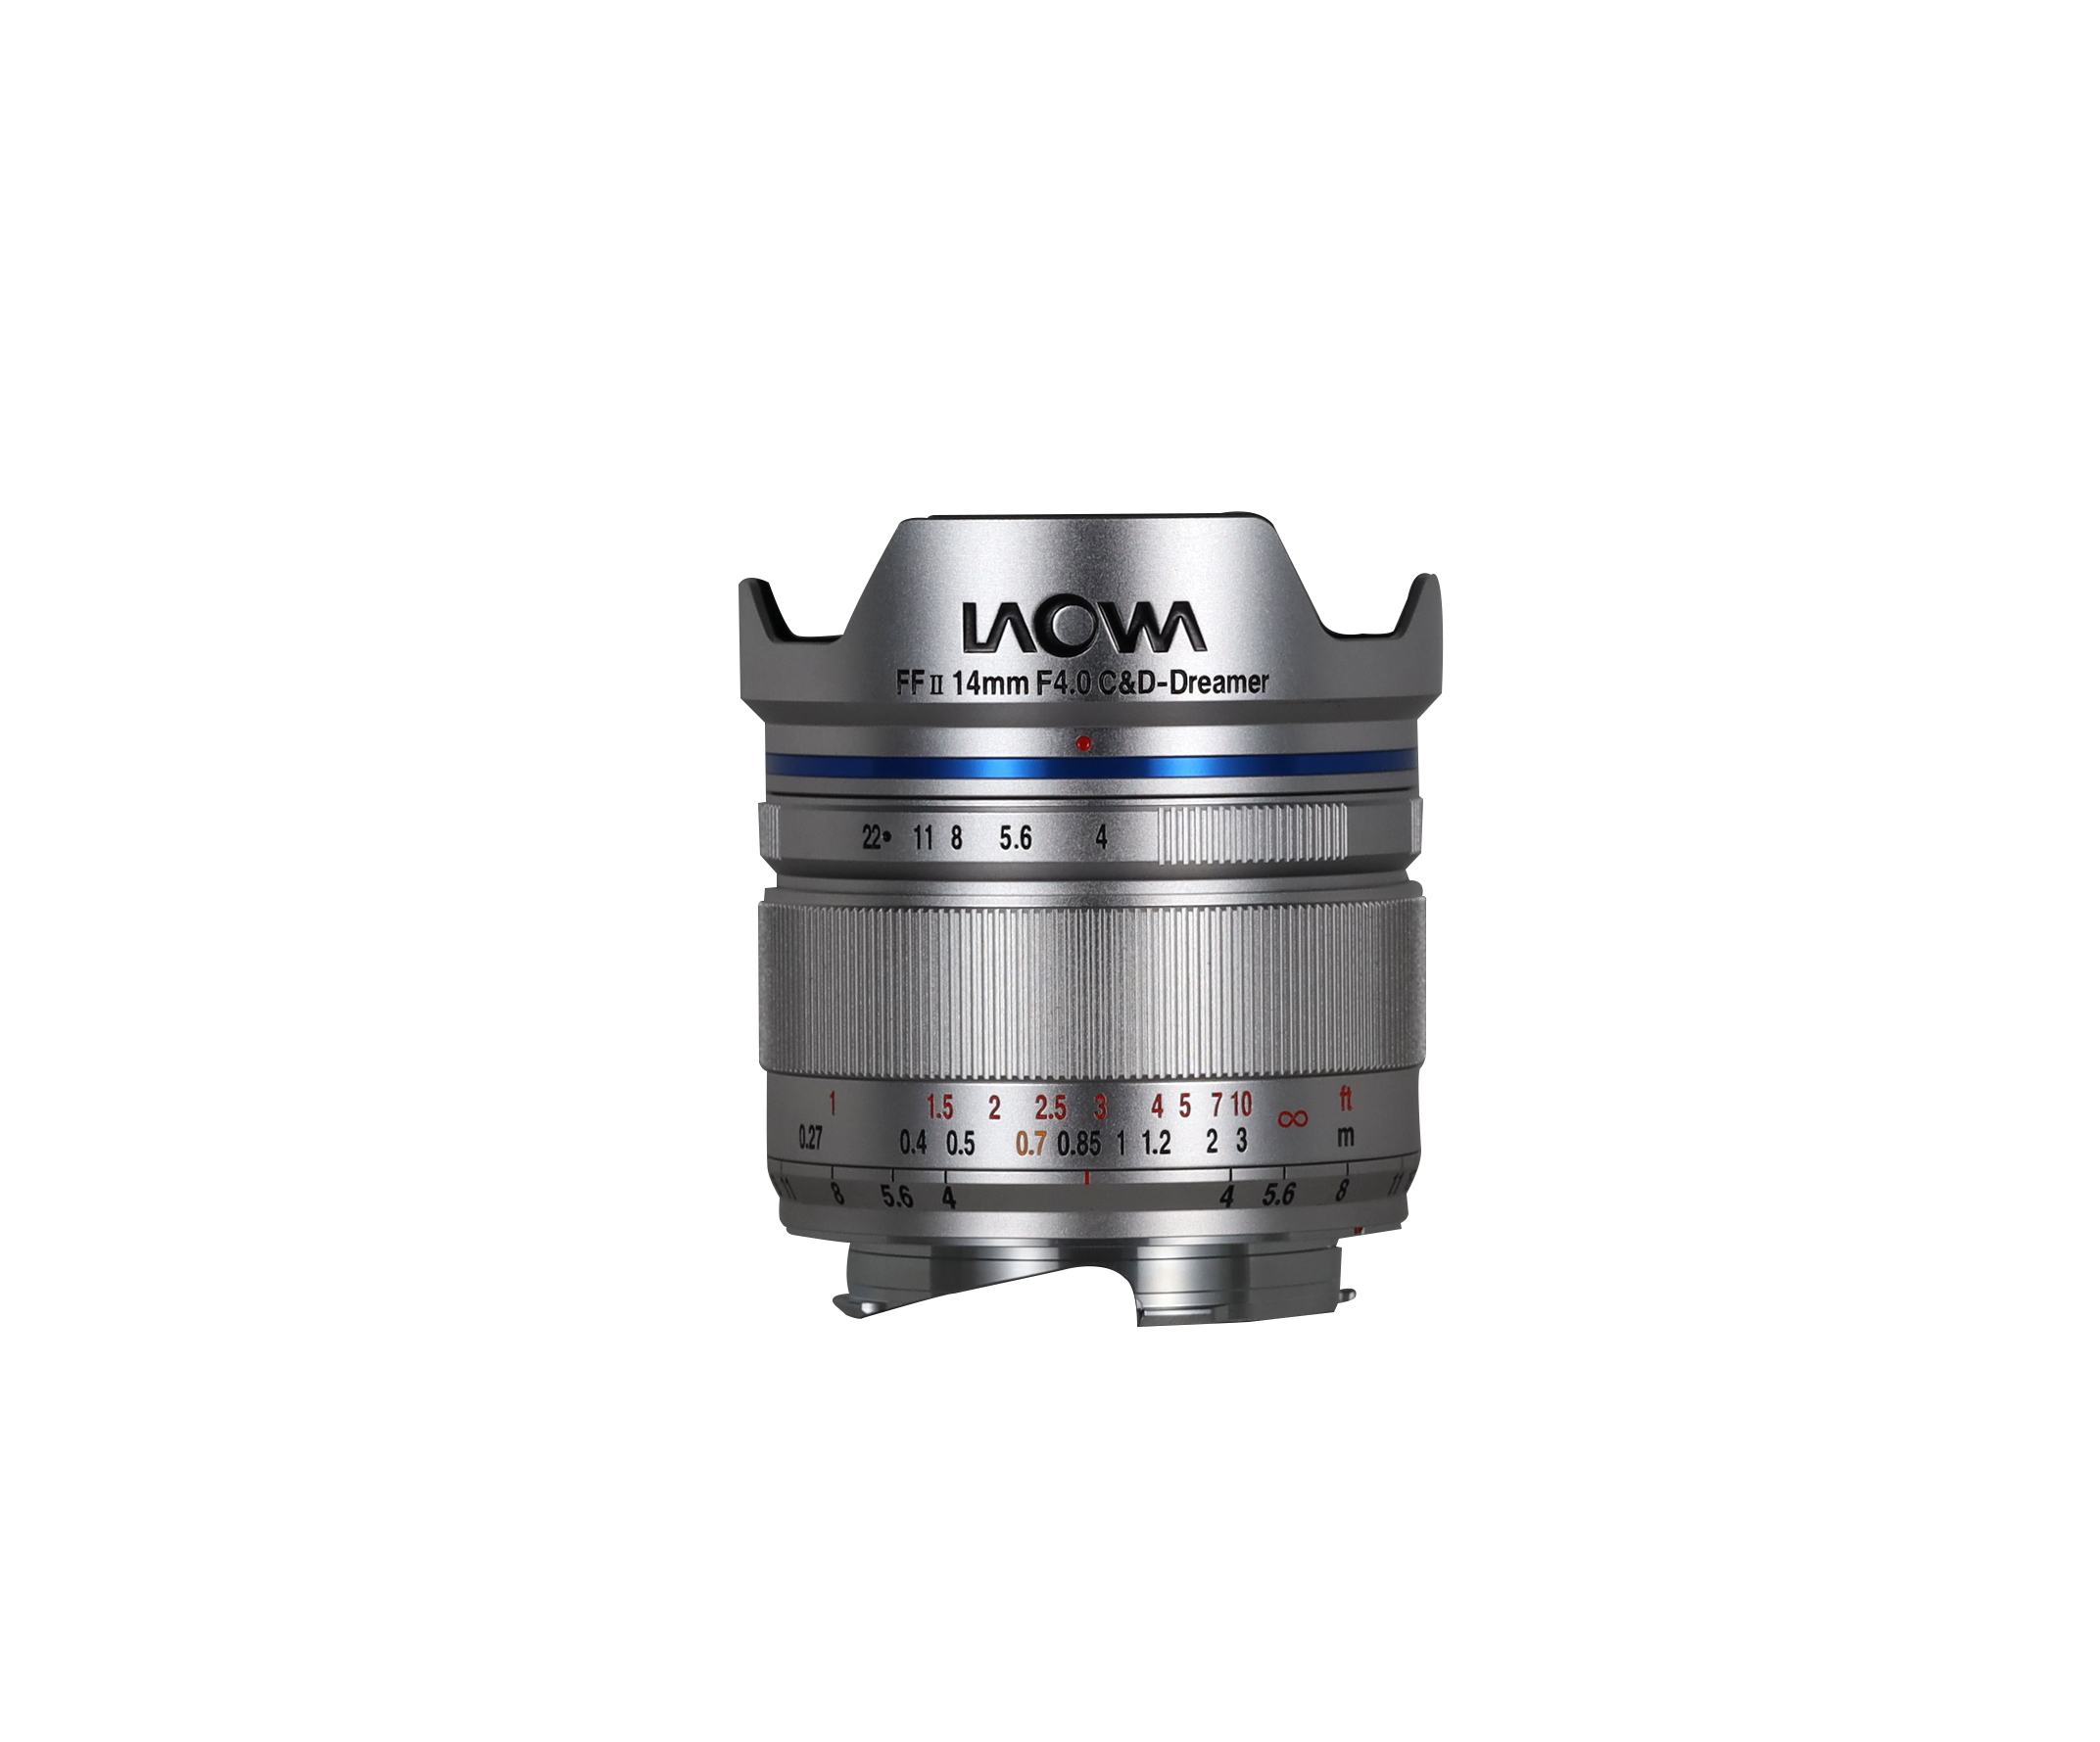 LAOWA 11mm F4.5 FF RL シルバー ライカMマウント【サイトロンジャパンオリジナル】